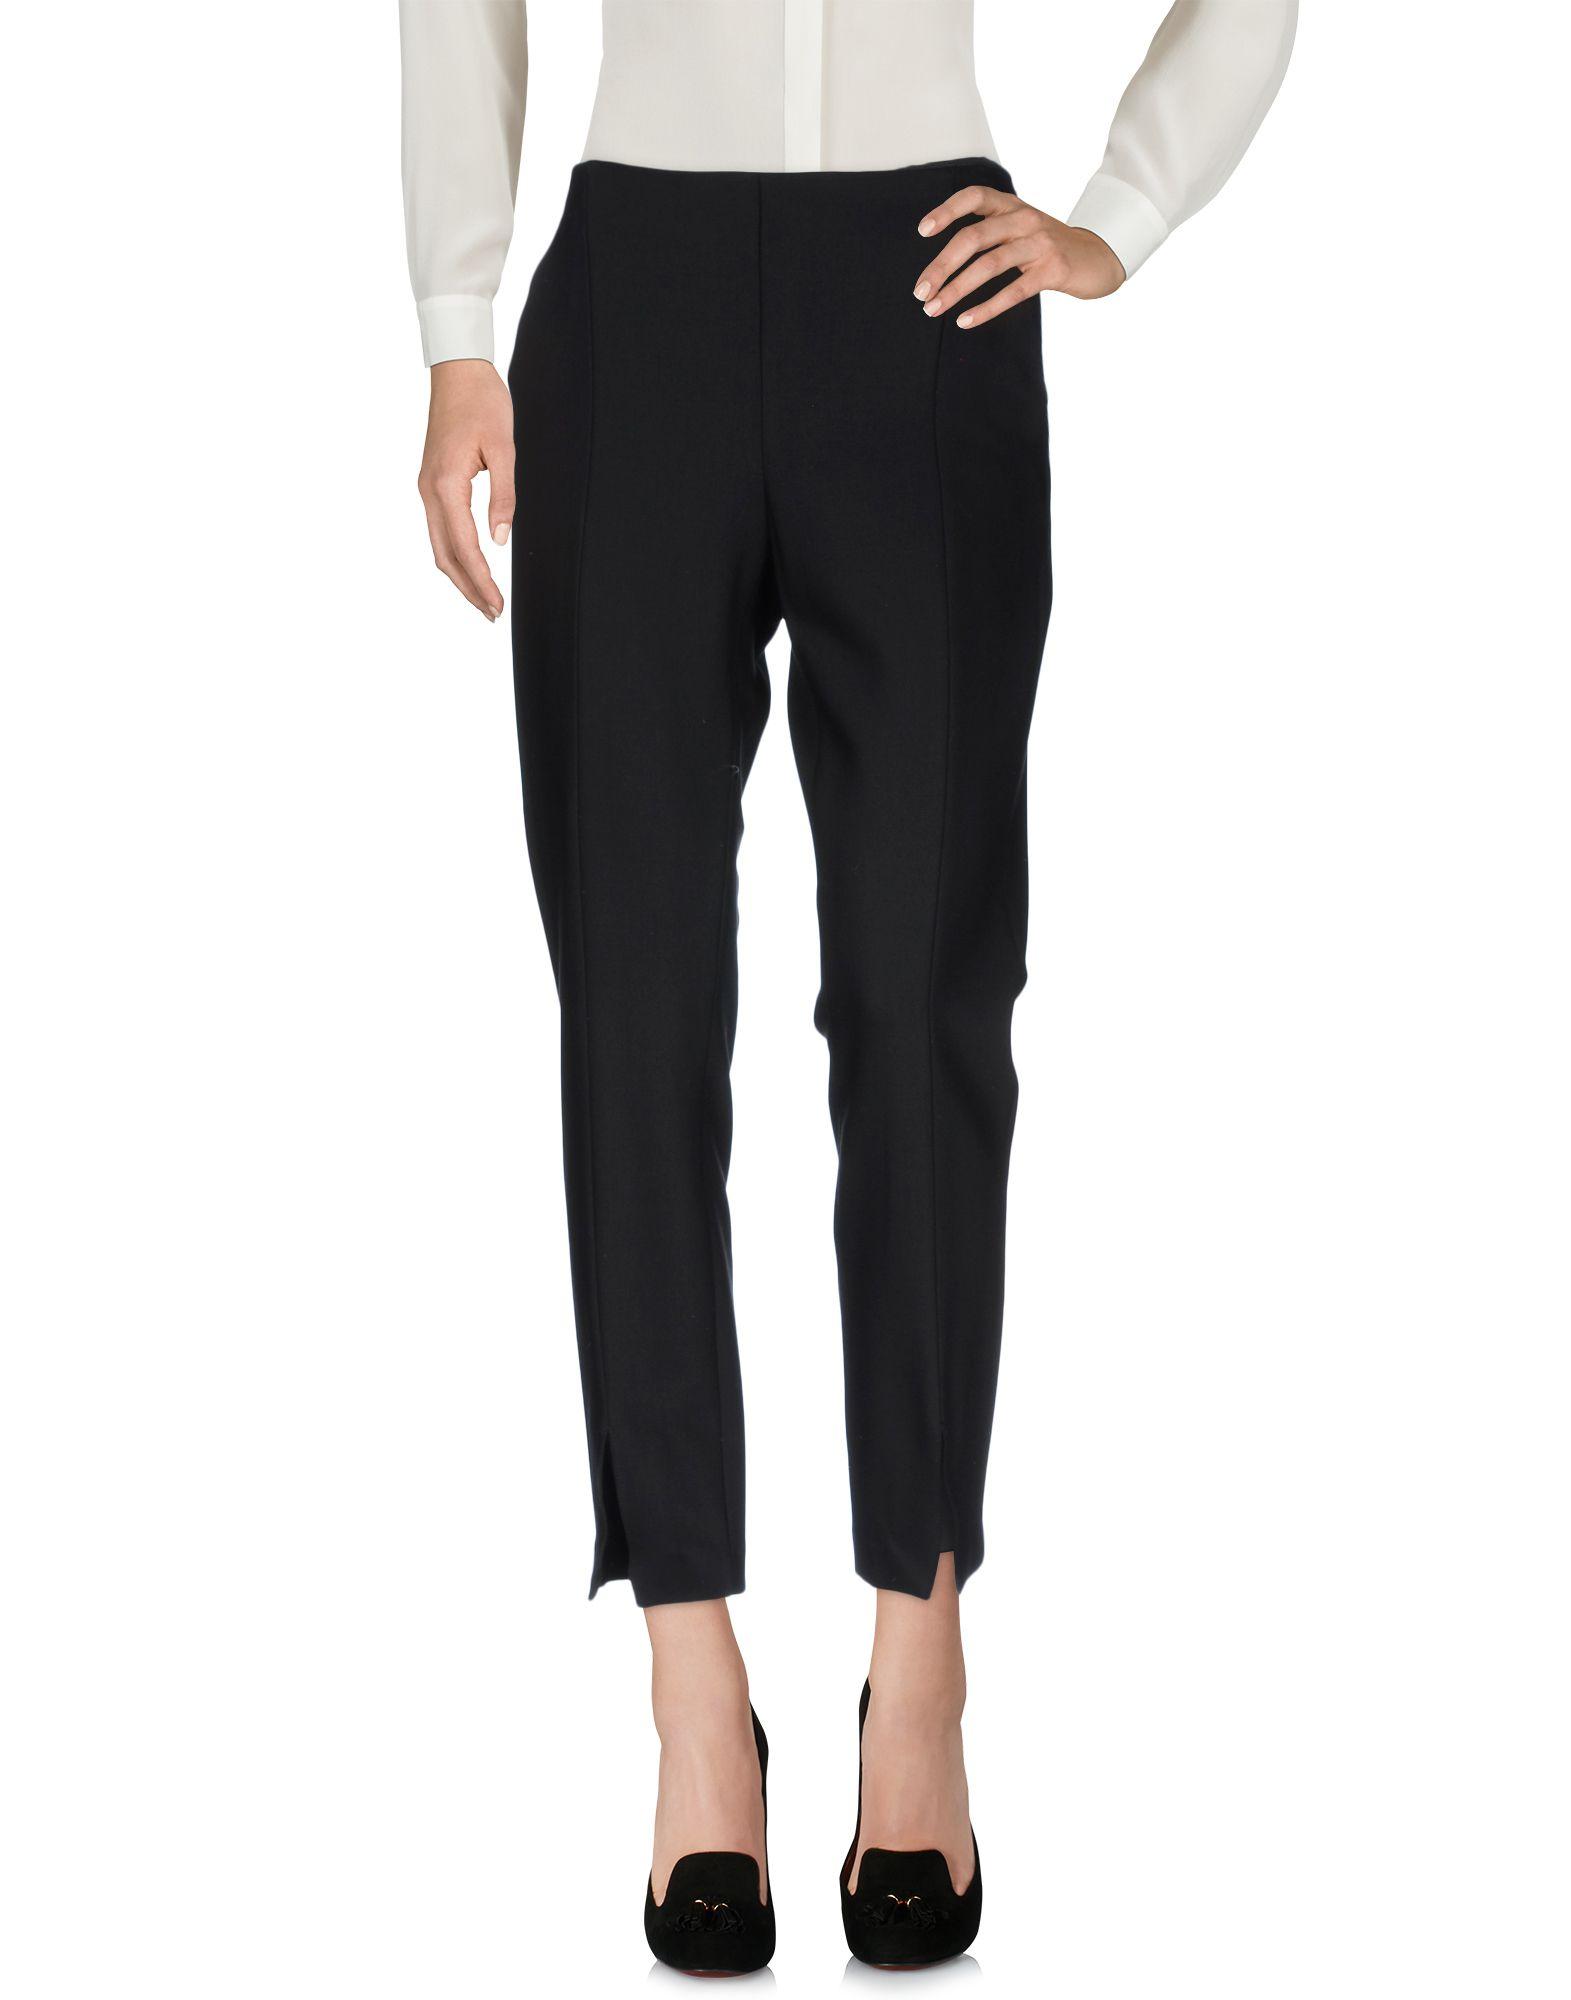 Pantalone Dondup Donna - Acquista online su 6OaAGd